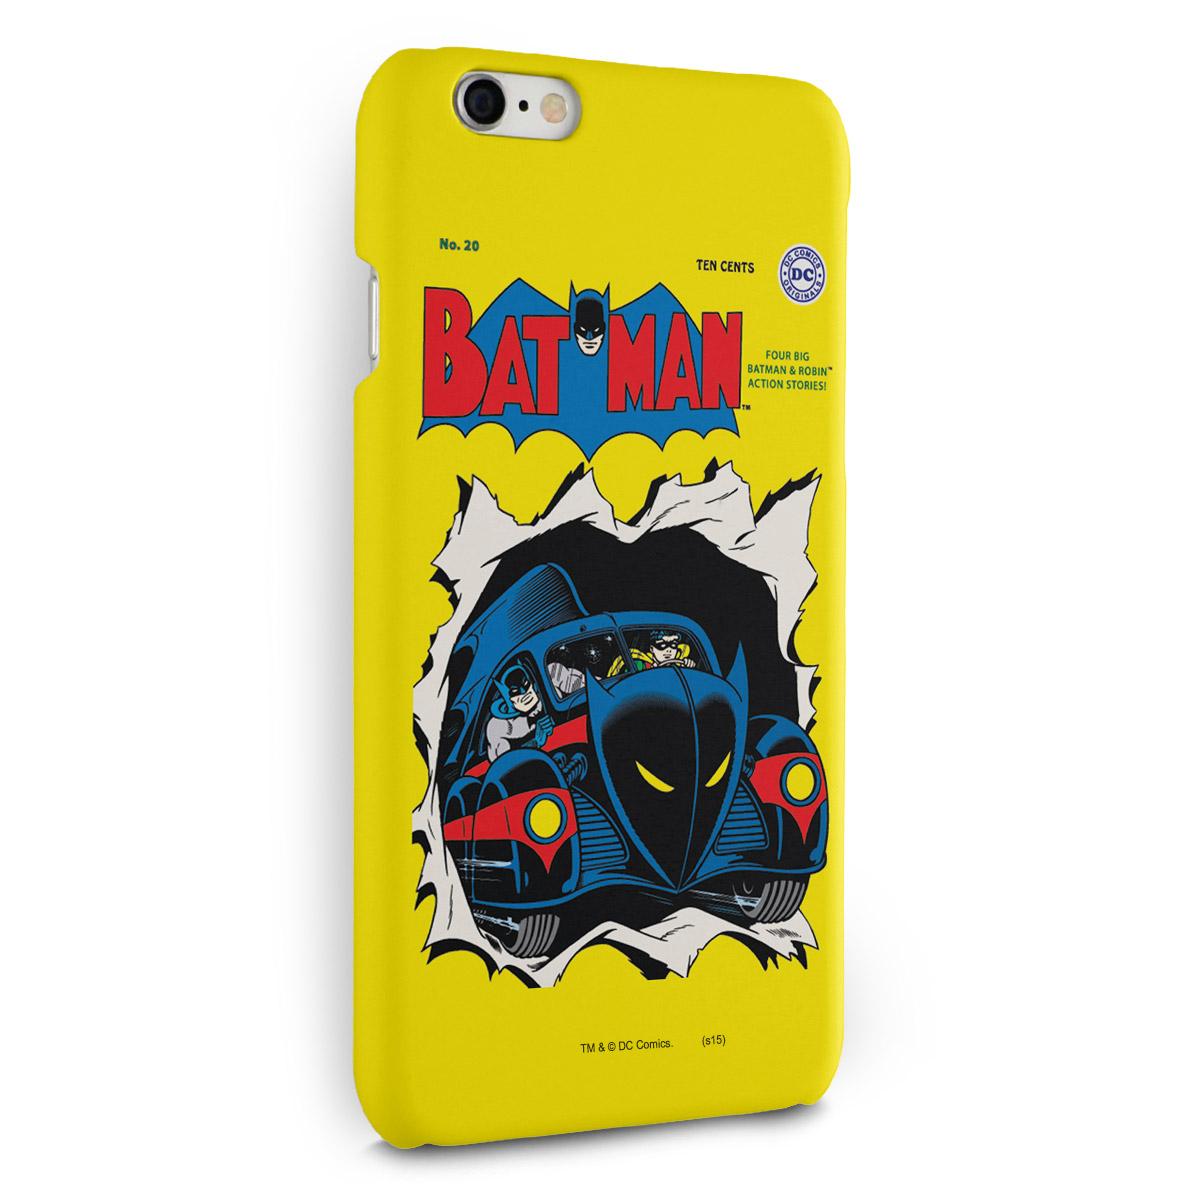 Capa para iPhone 6/6S Plus Batman HQ N°20